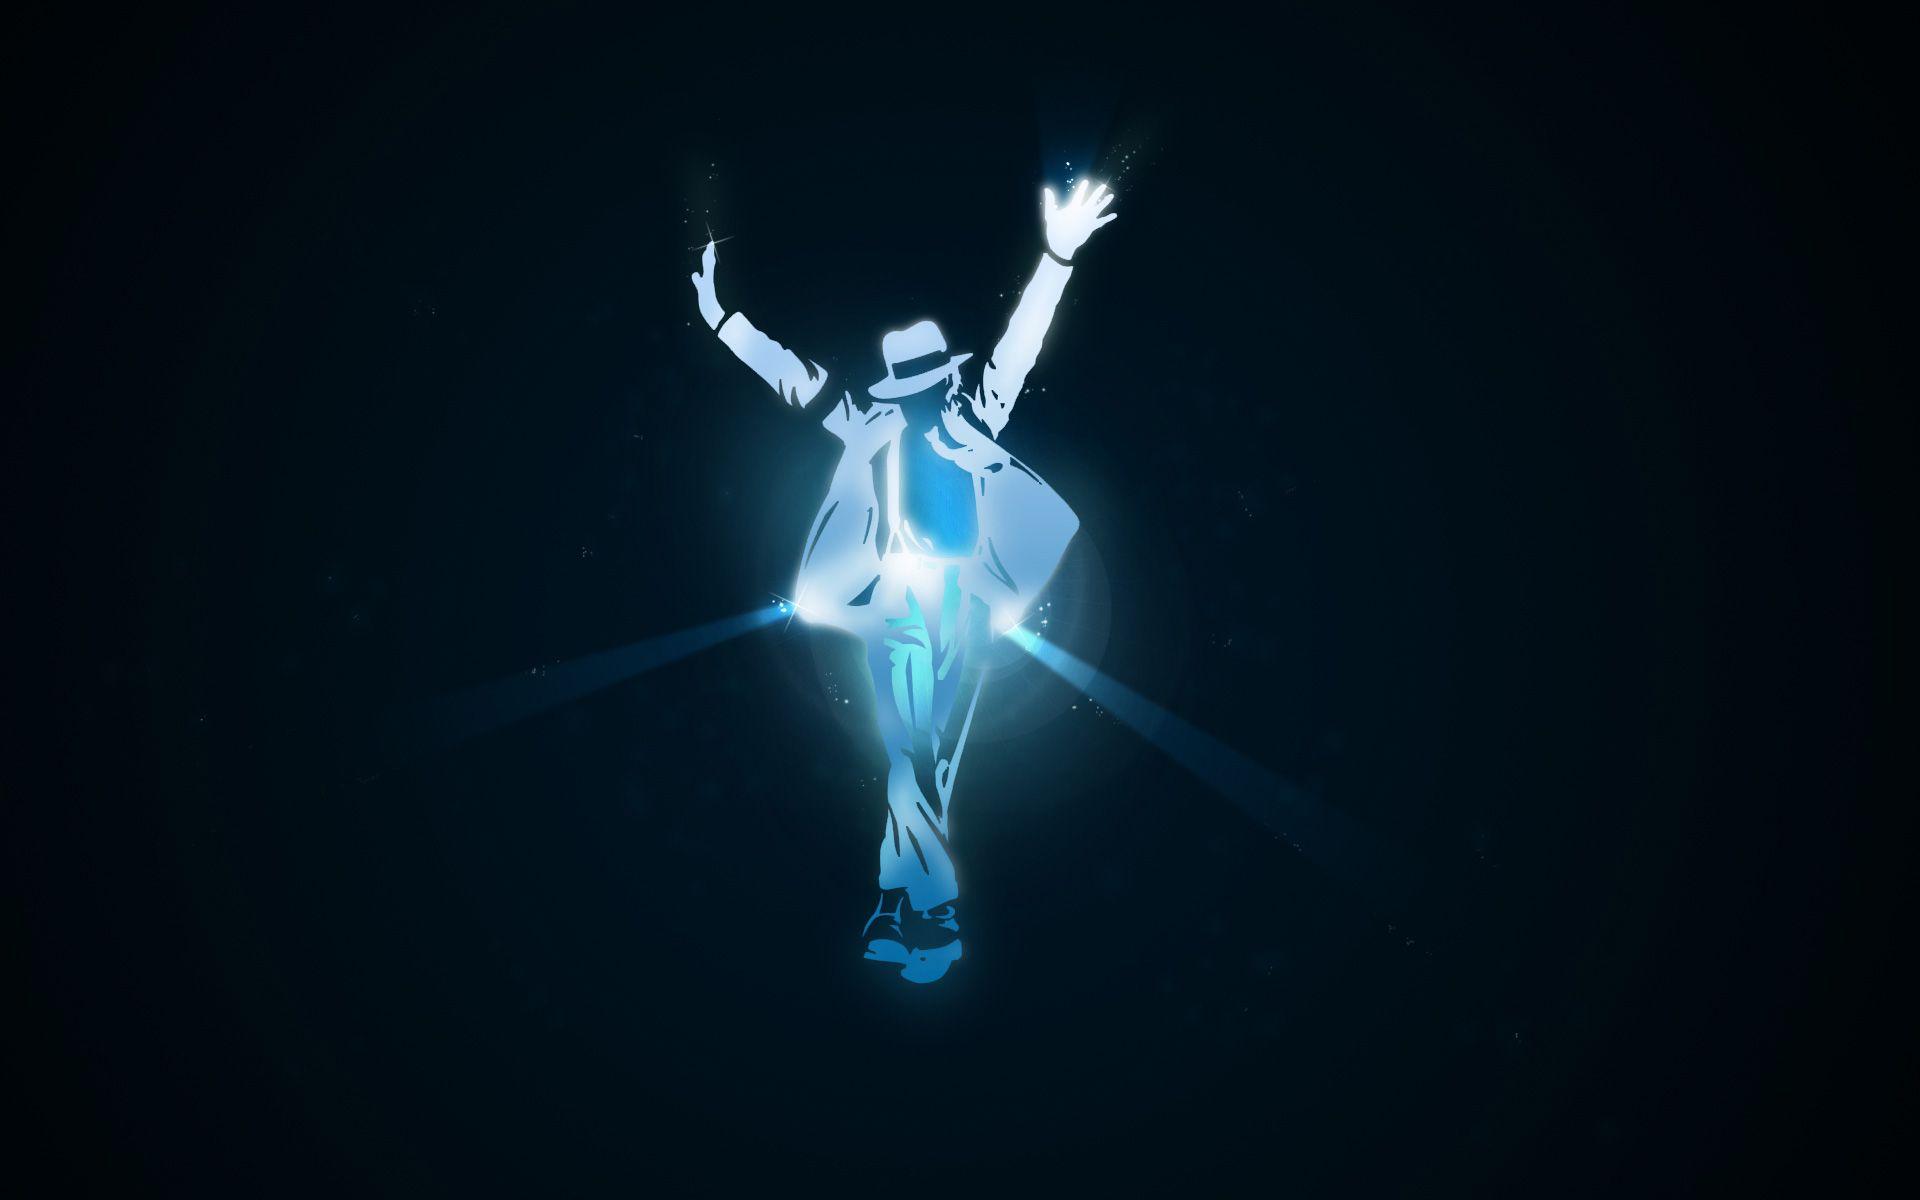 Michael Jackson wallpaper 900631